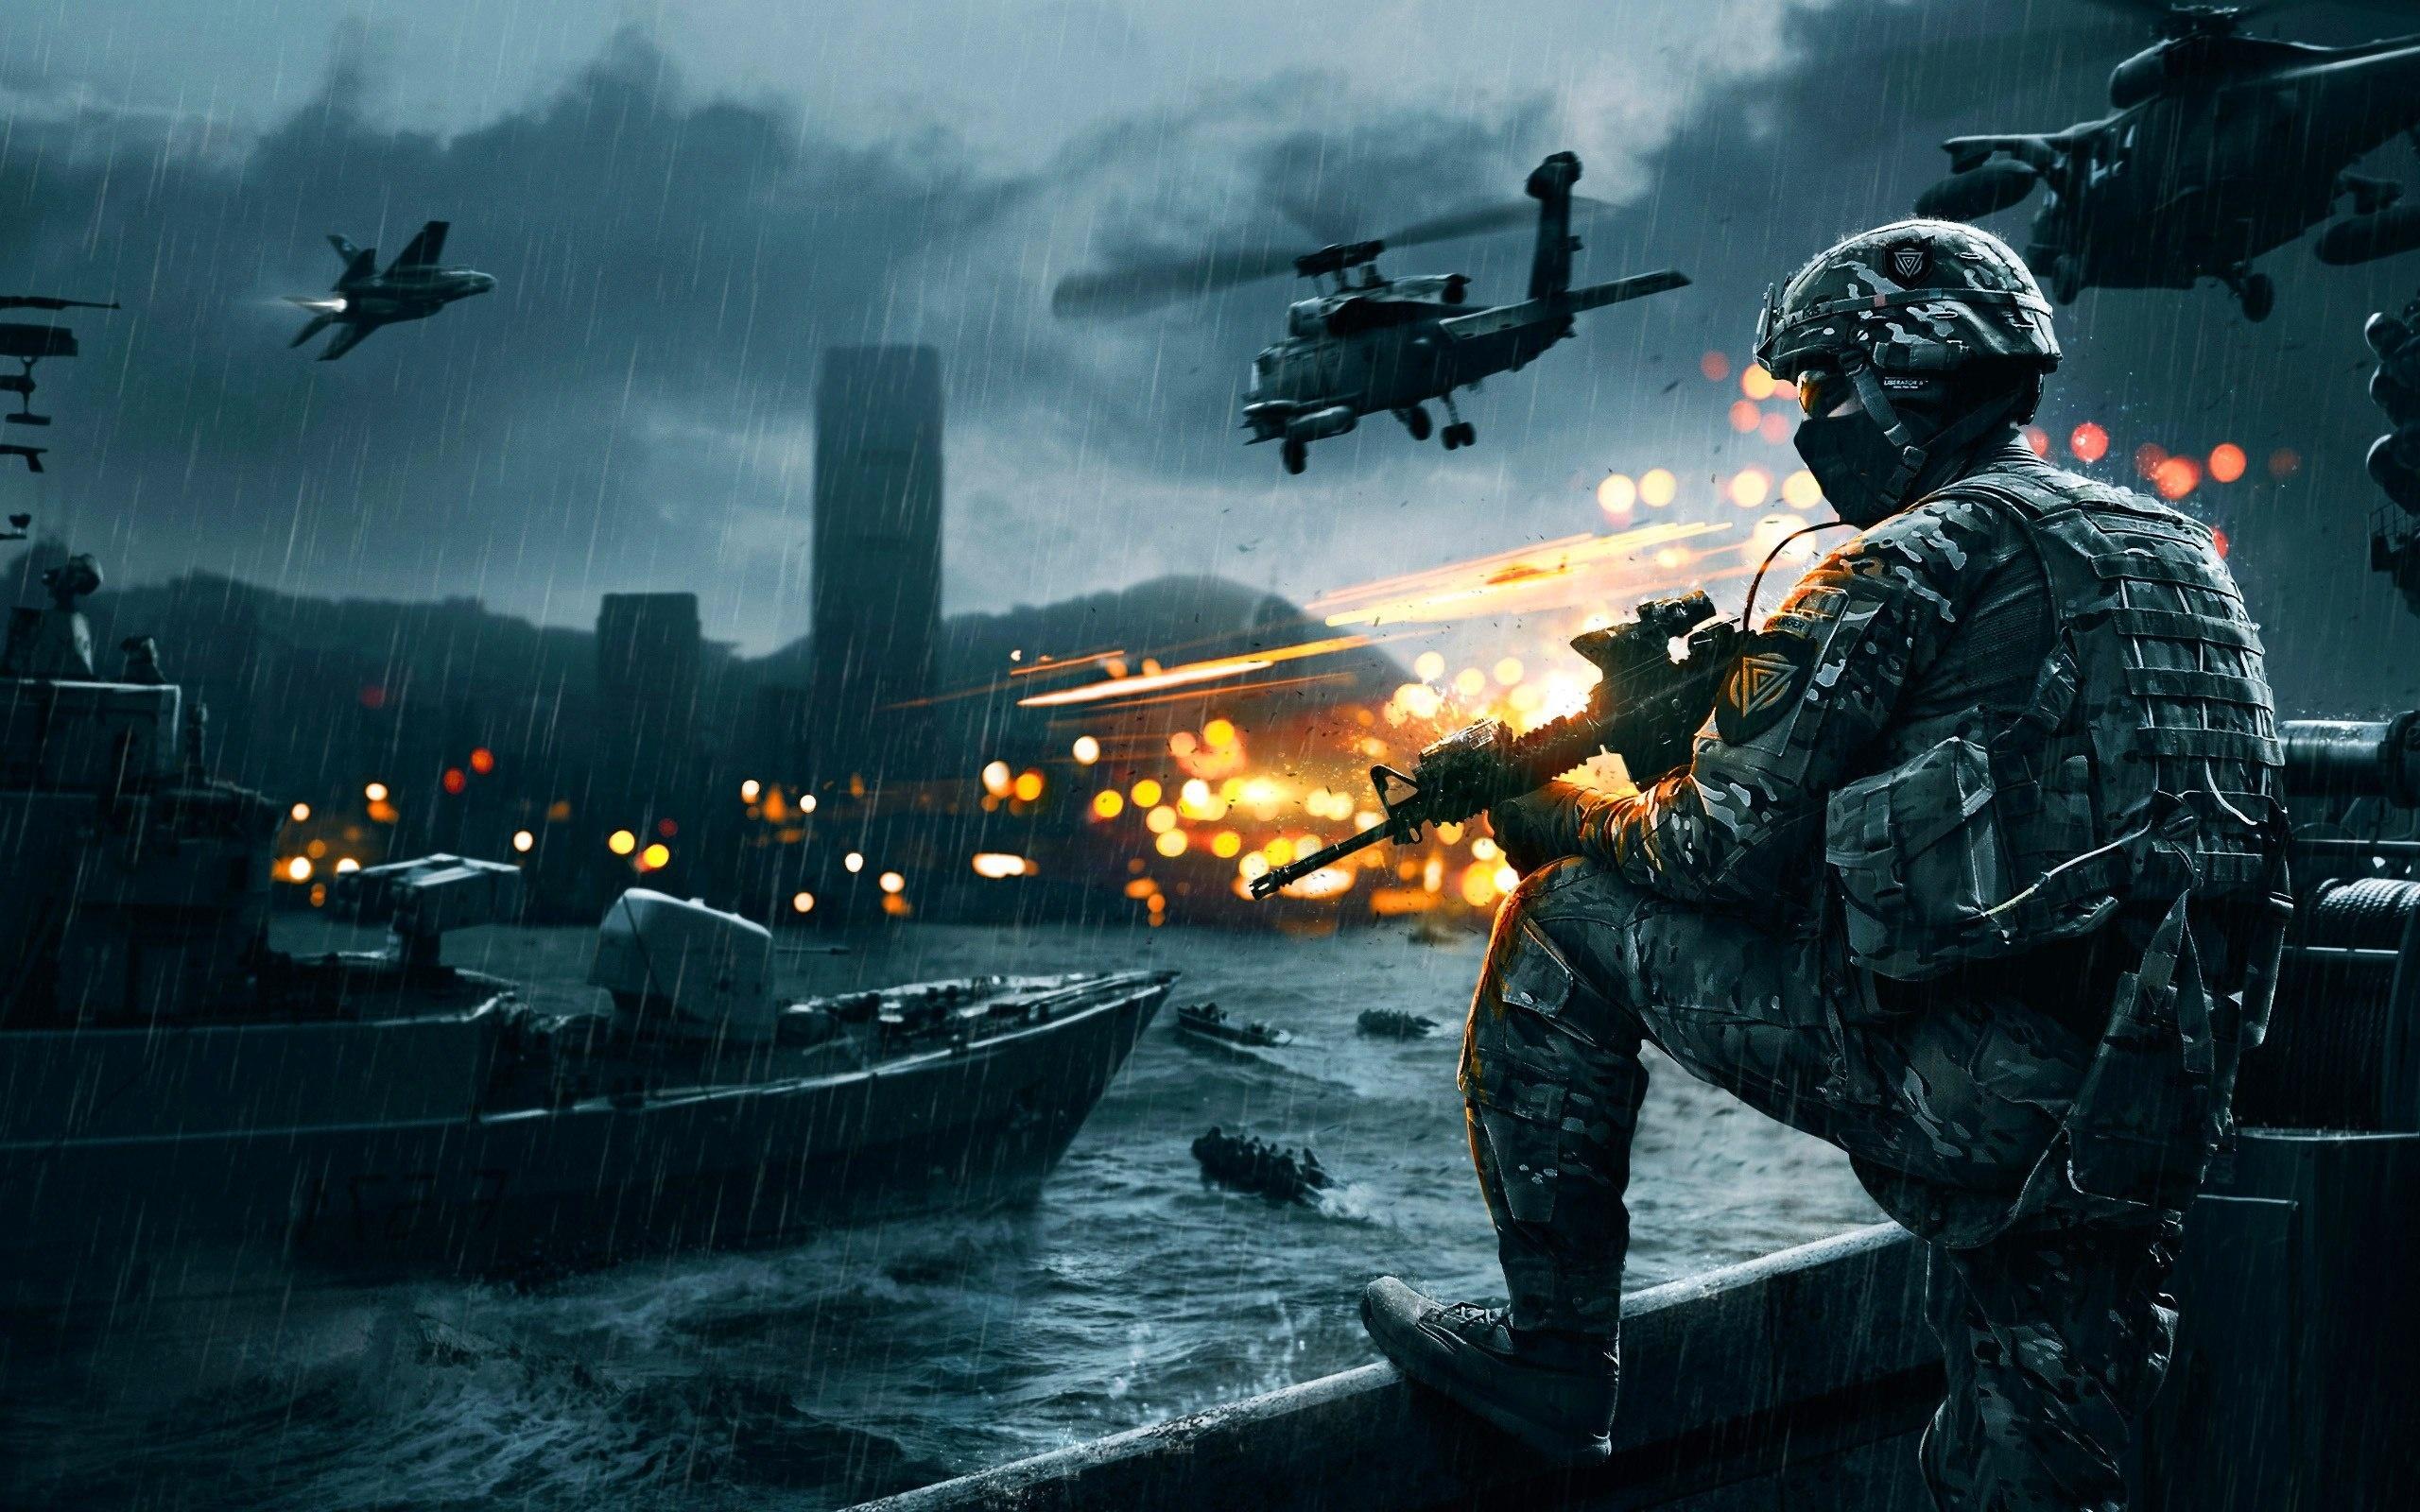 Battlefield 4 Ea Digital Illusions Ce